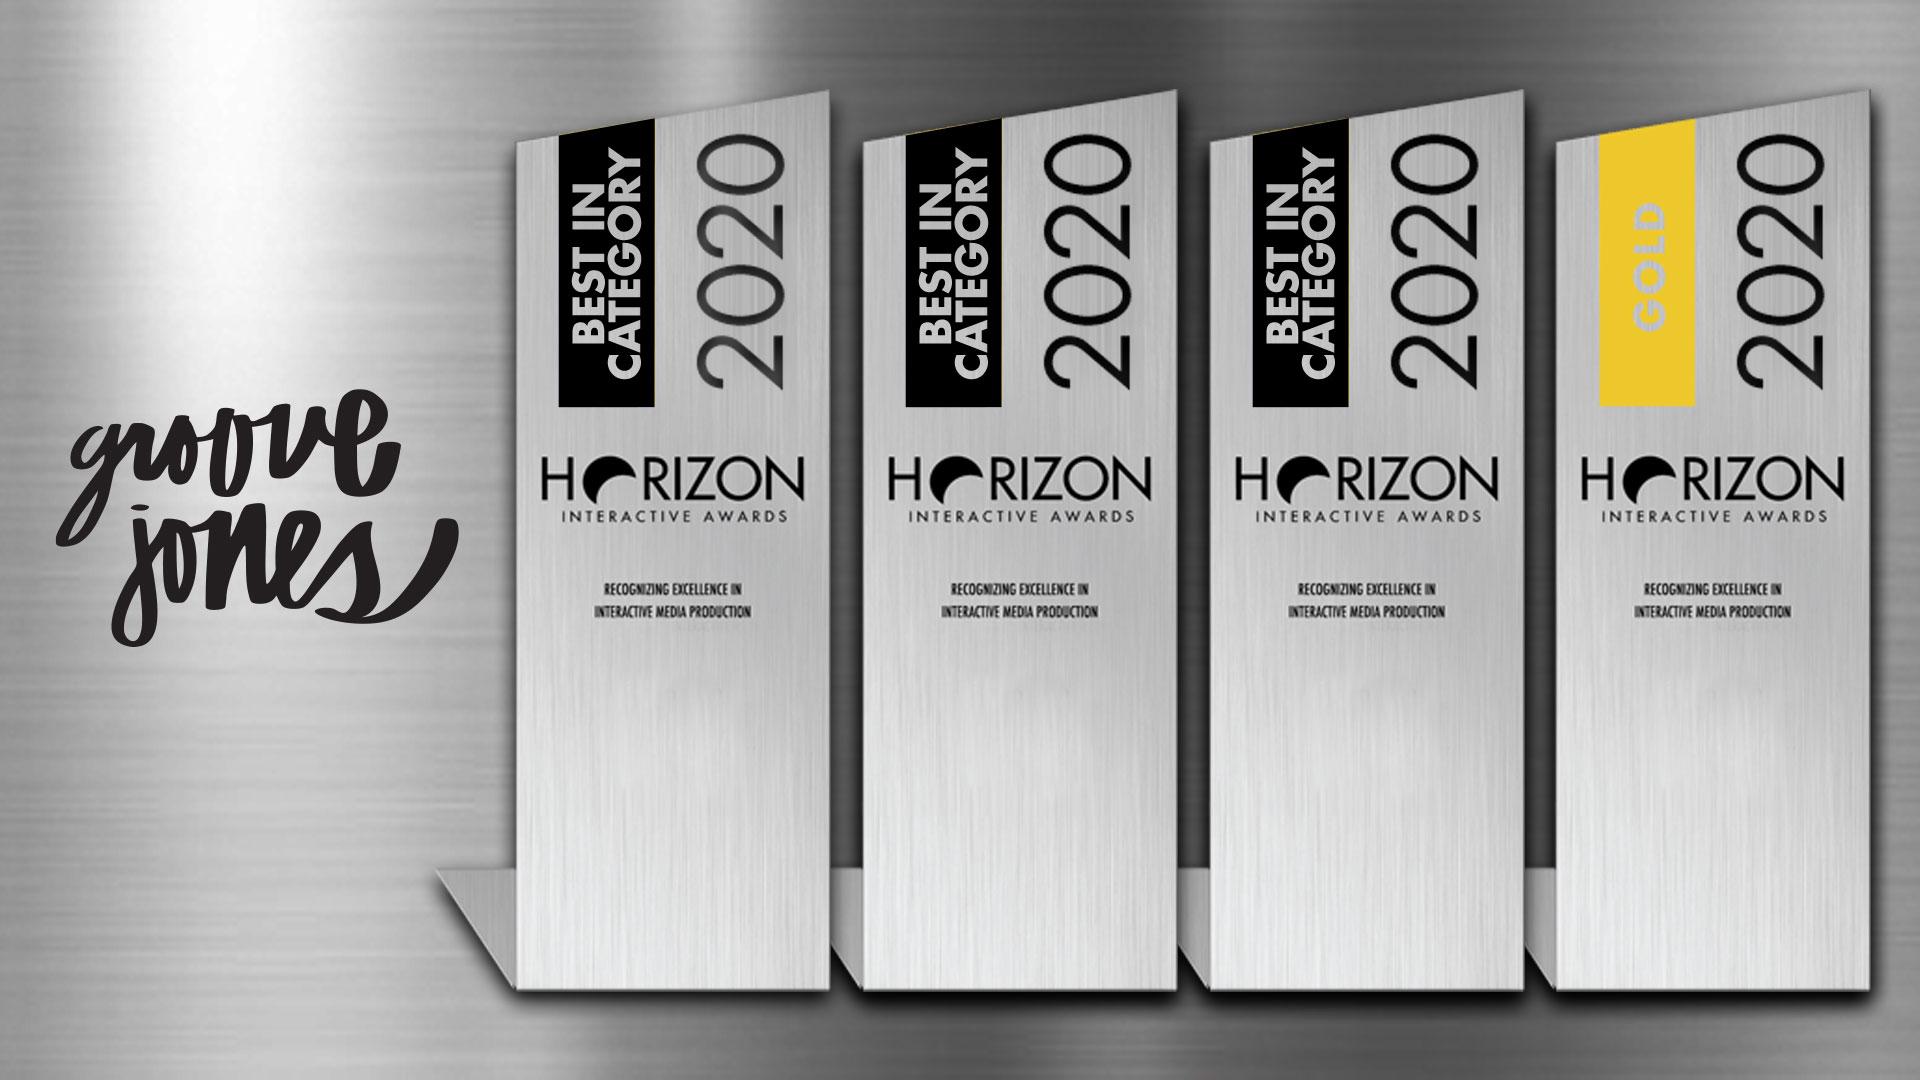 Horizon Awards